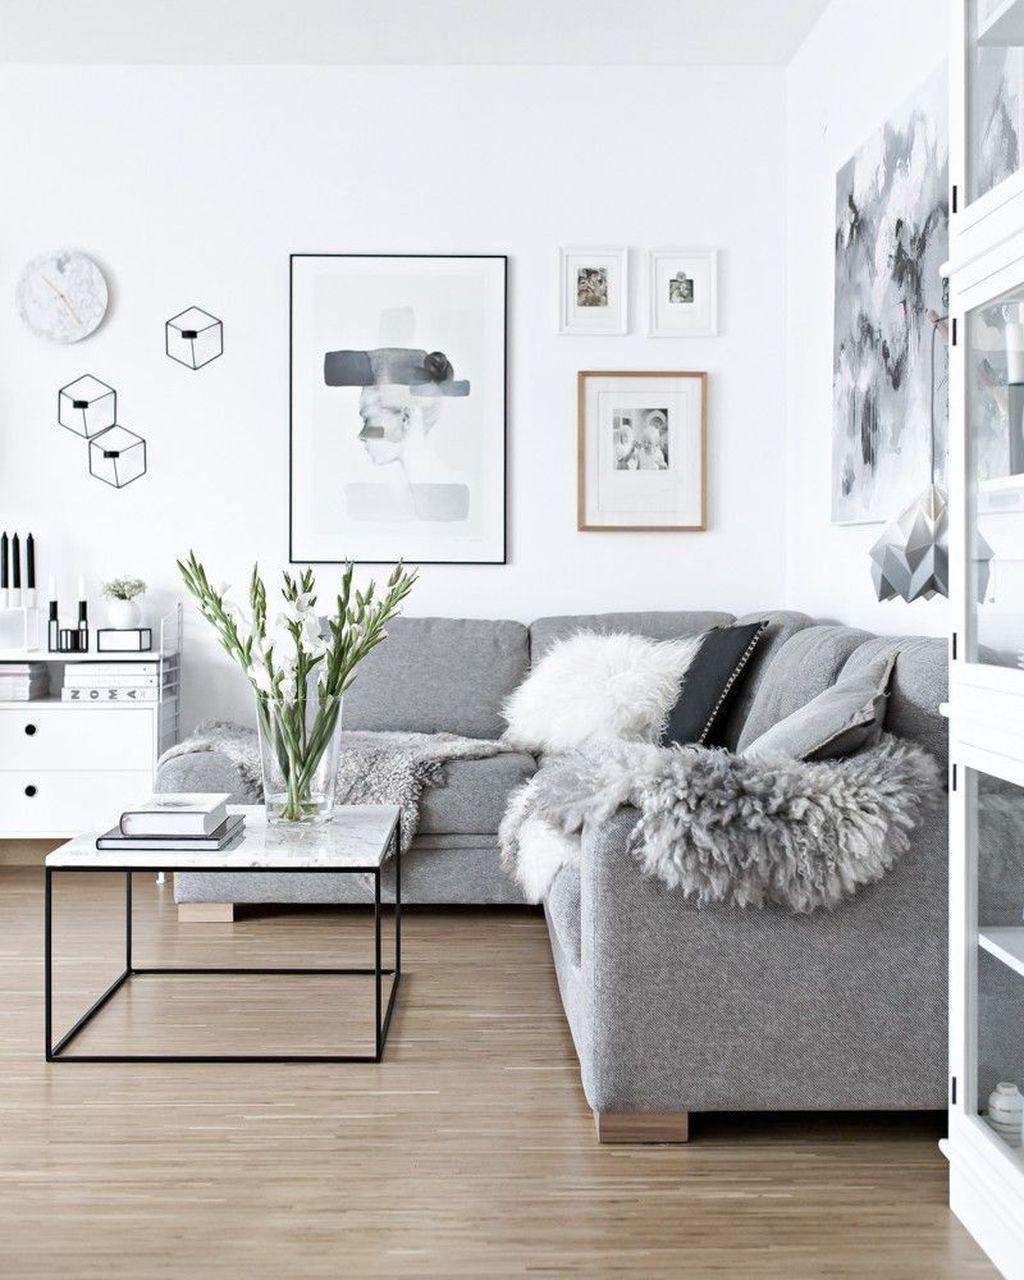 30 Small Living Room Decorating Ideas: Nice 42 Cozy Small Living Room Decor Ideas On A Budget